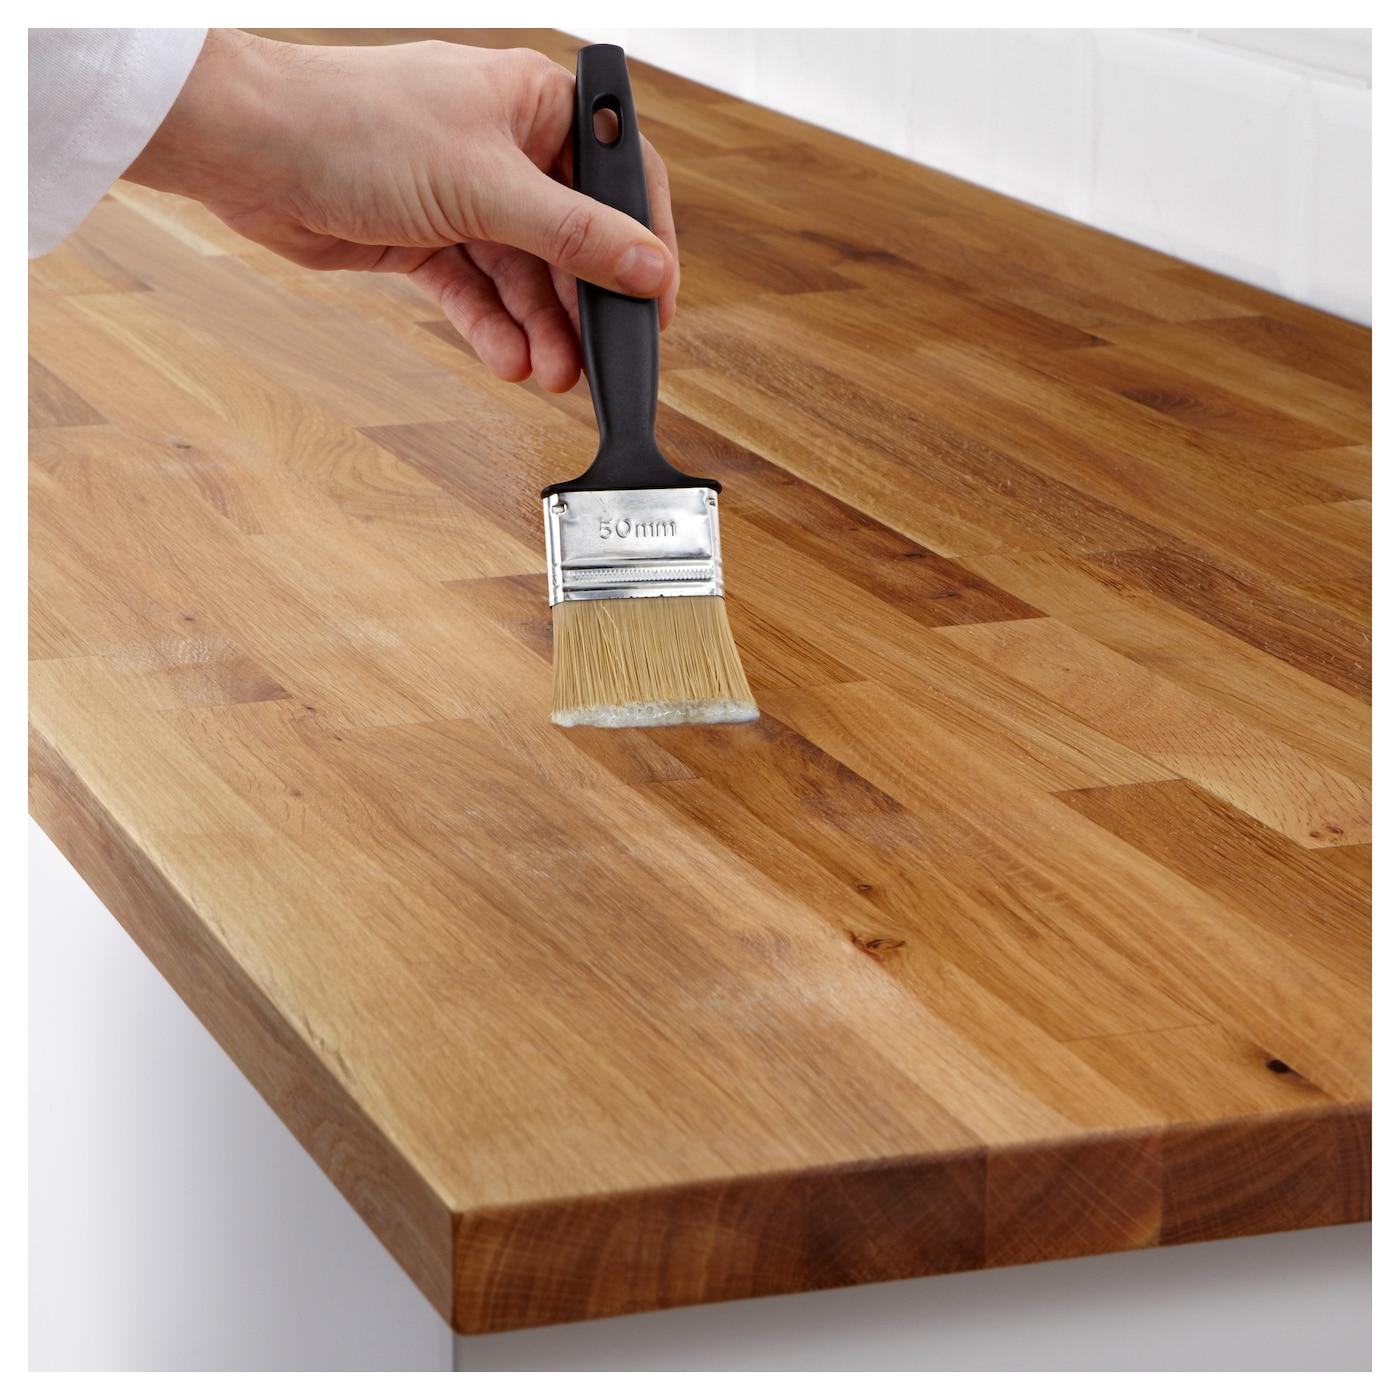 BEHANDLA Wood treatment oil, indoor use - IKEA